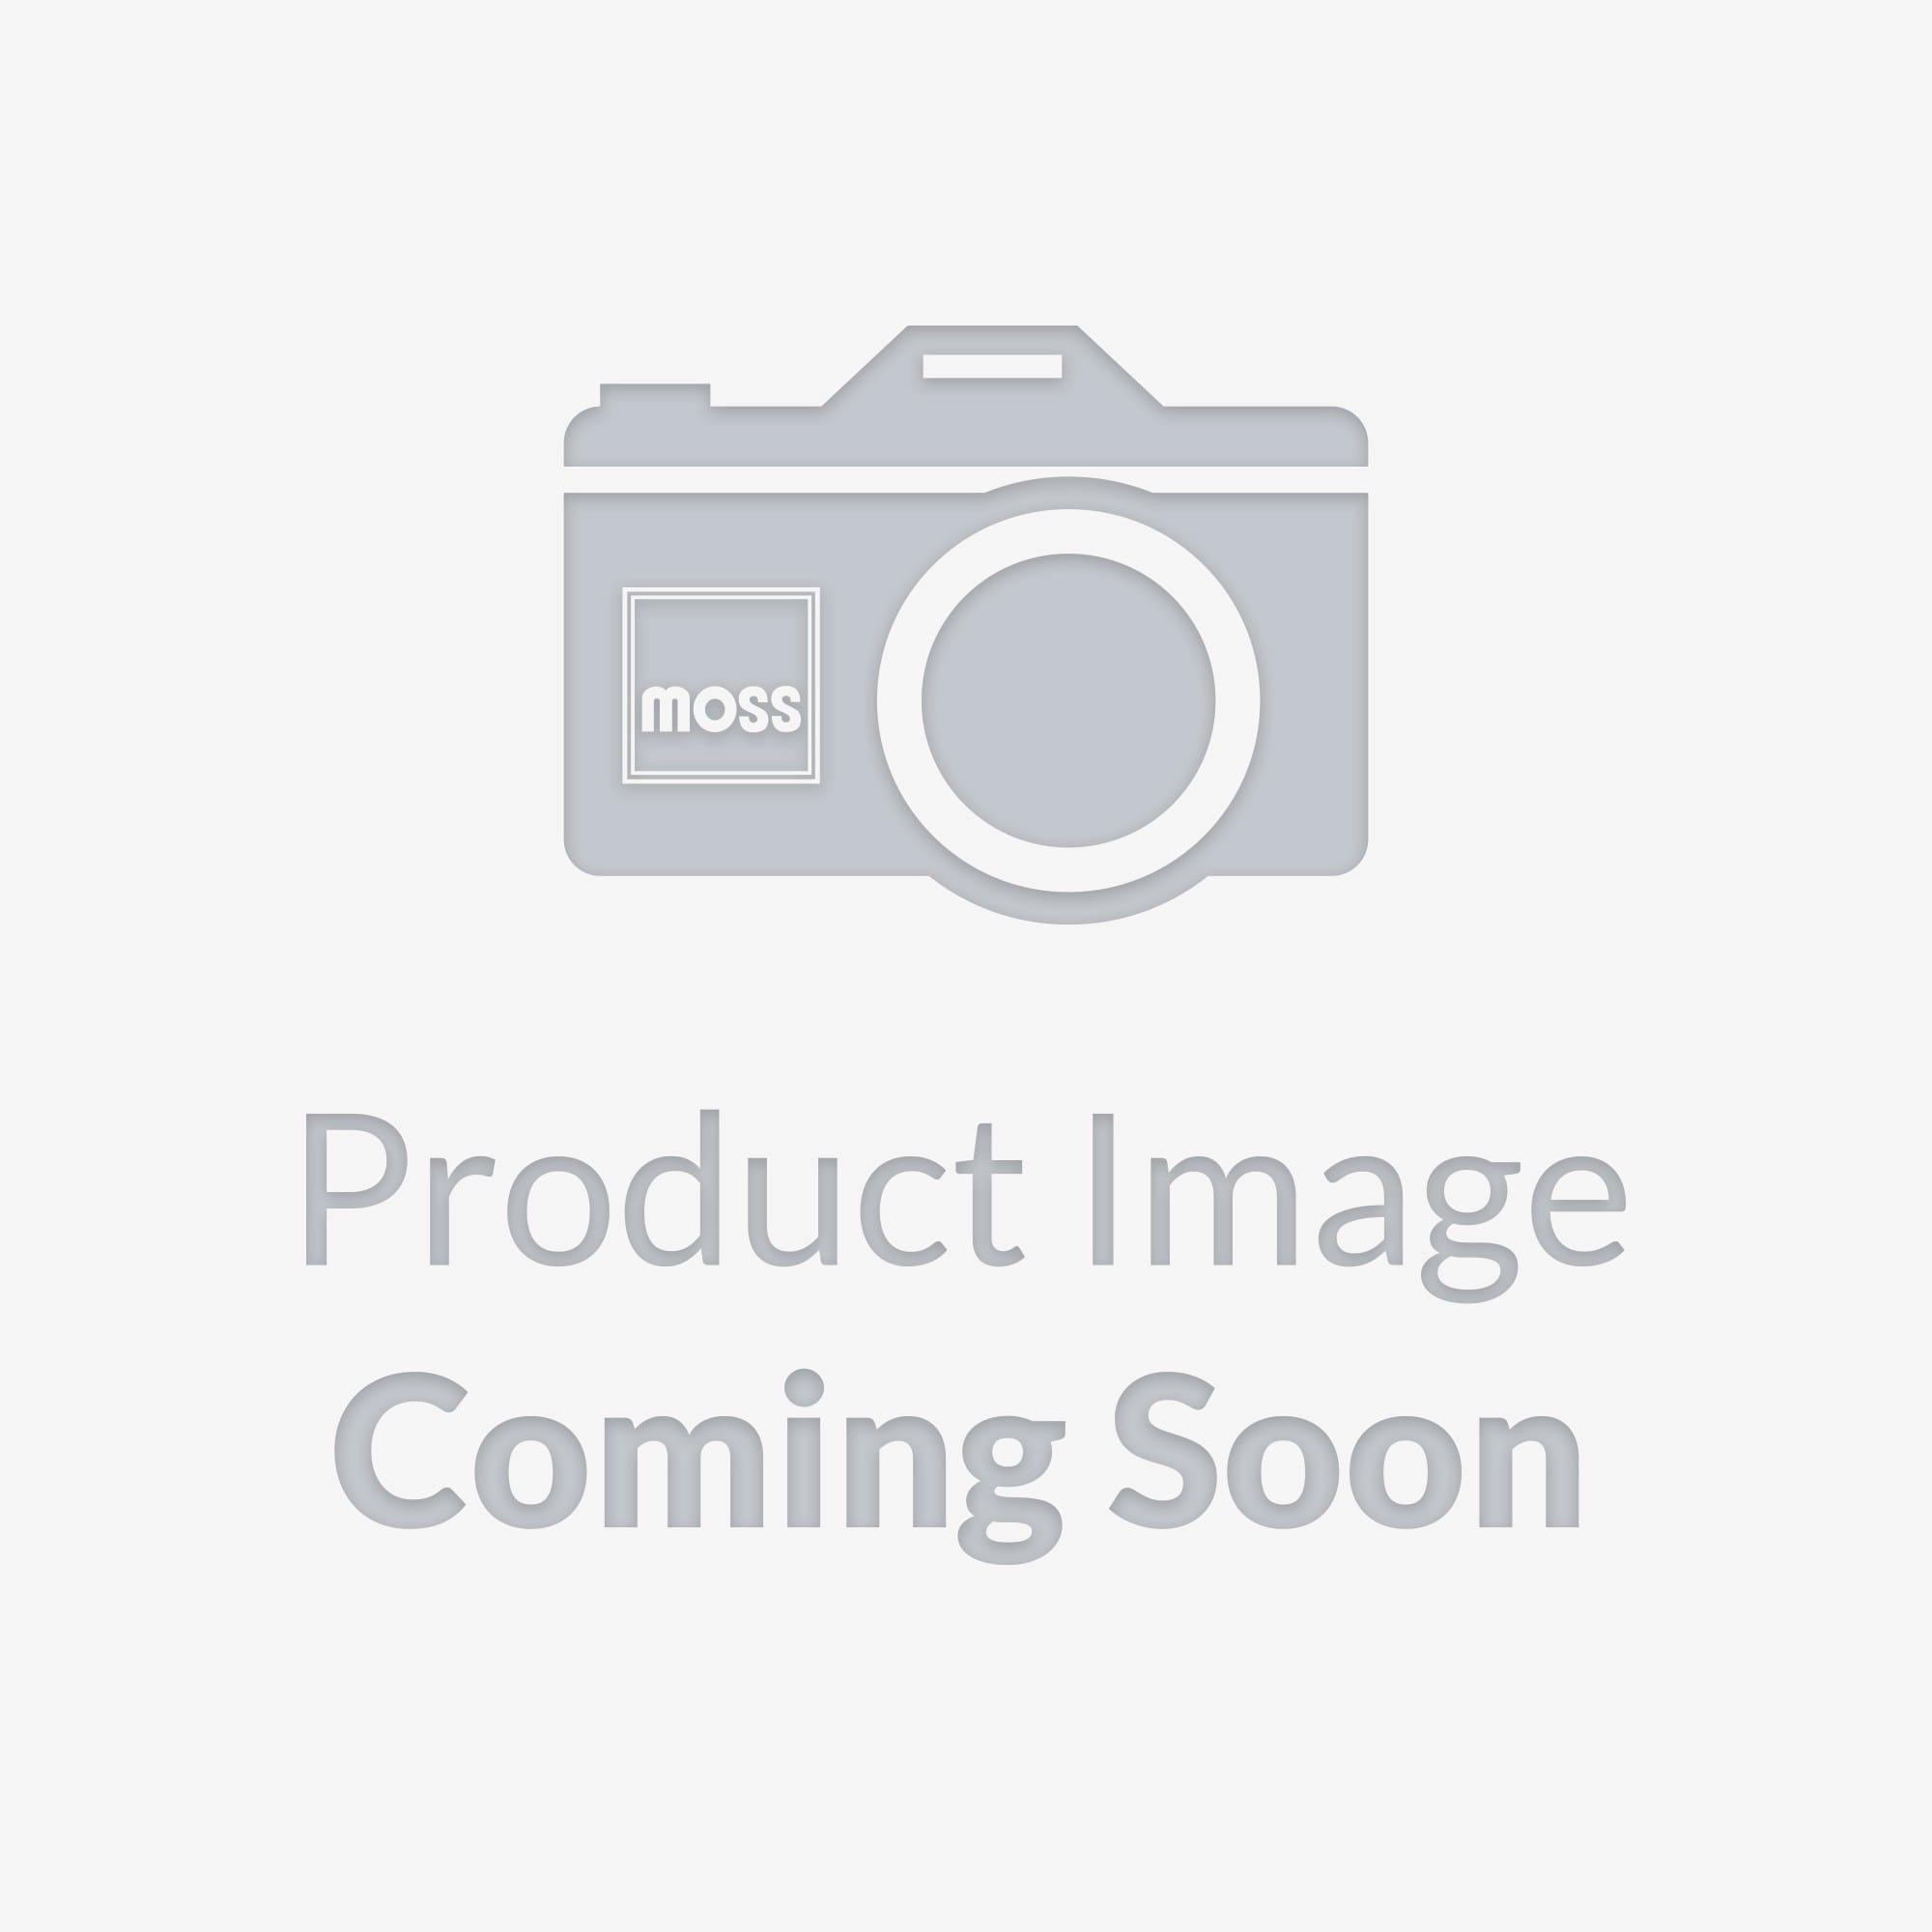 jaguar x type 2.0 diesel engine diagram